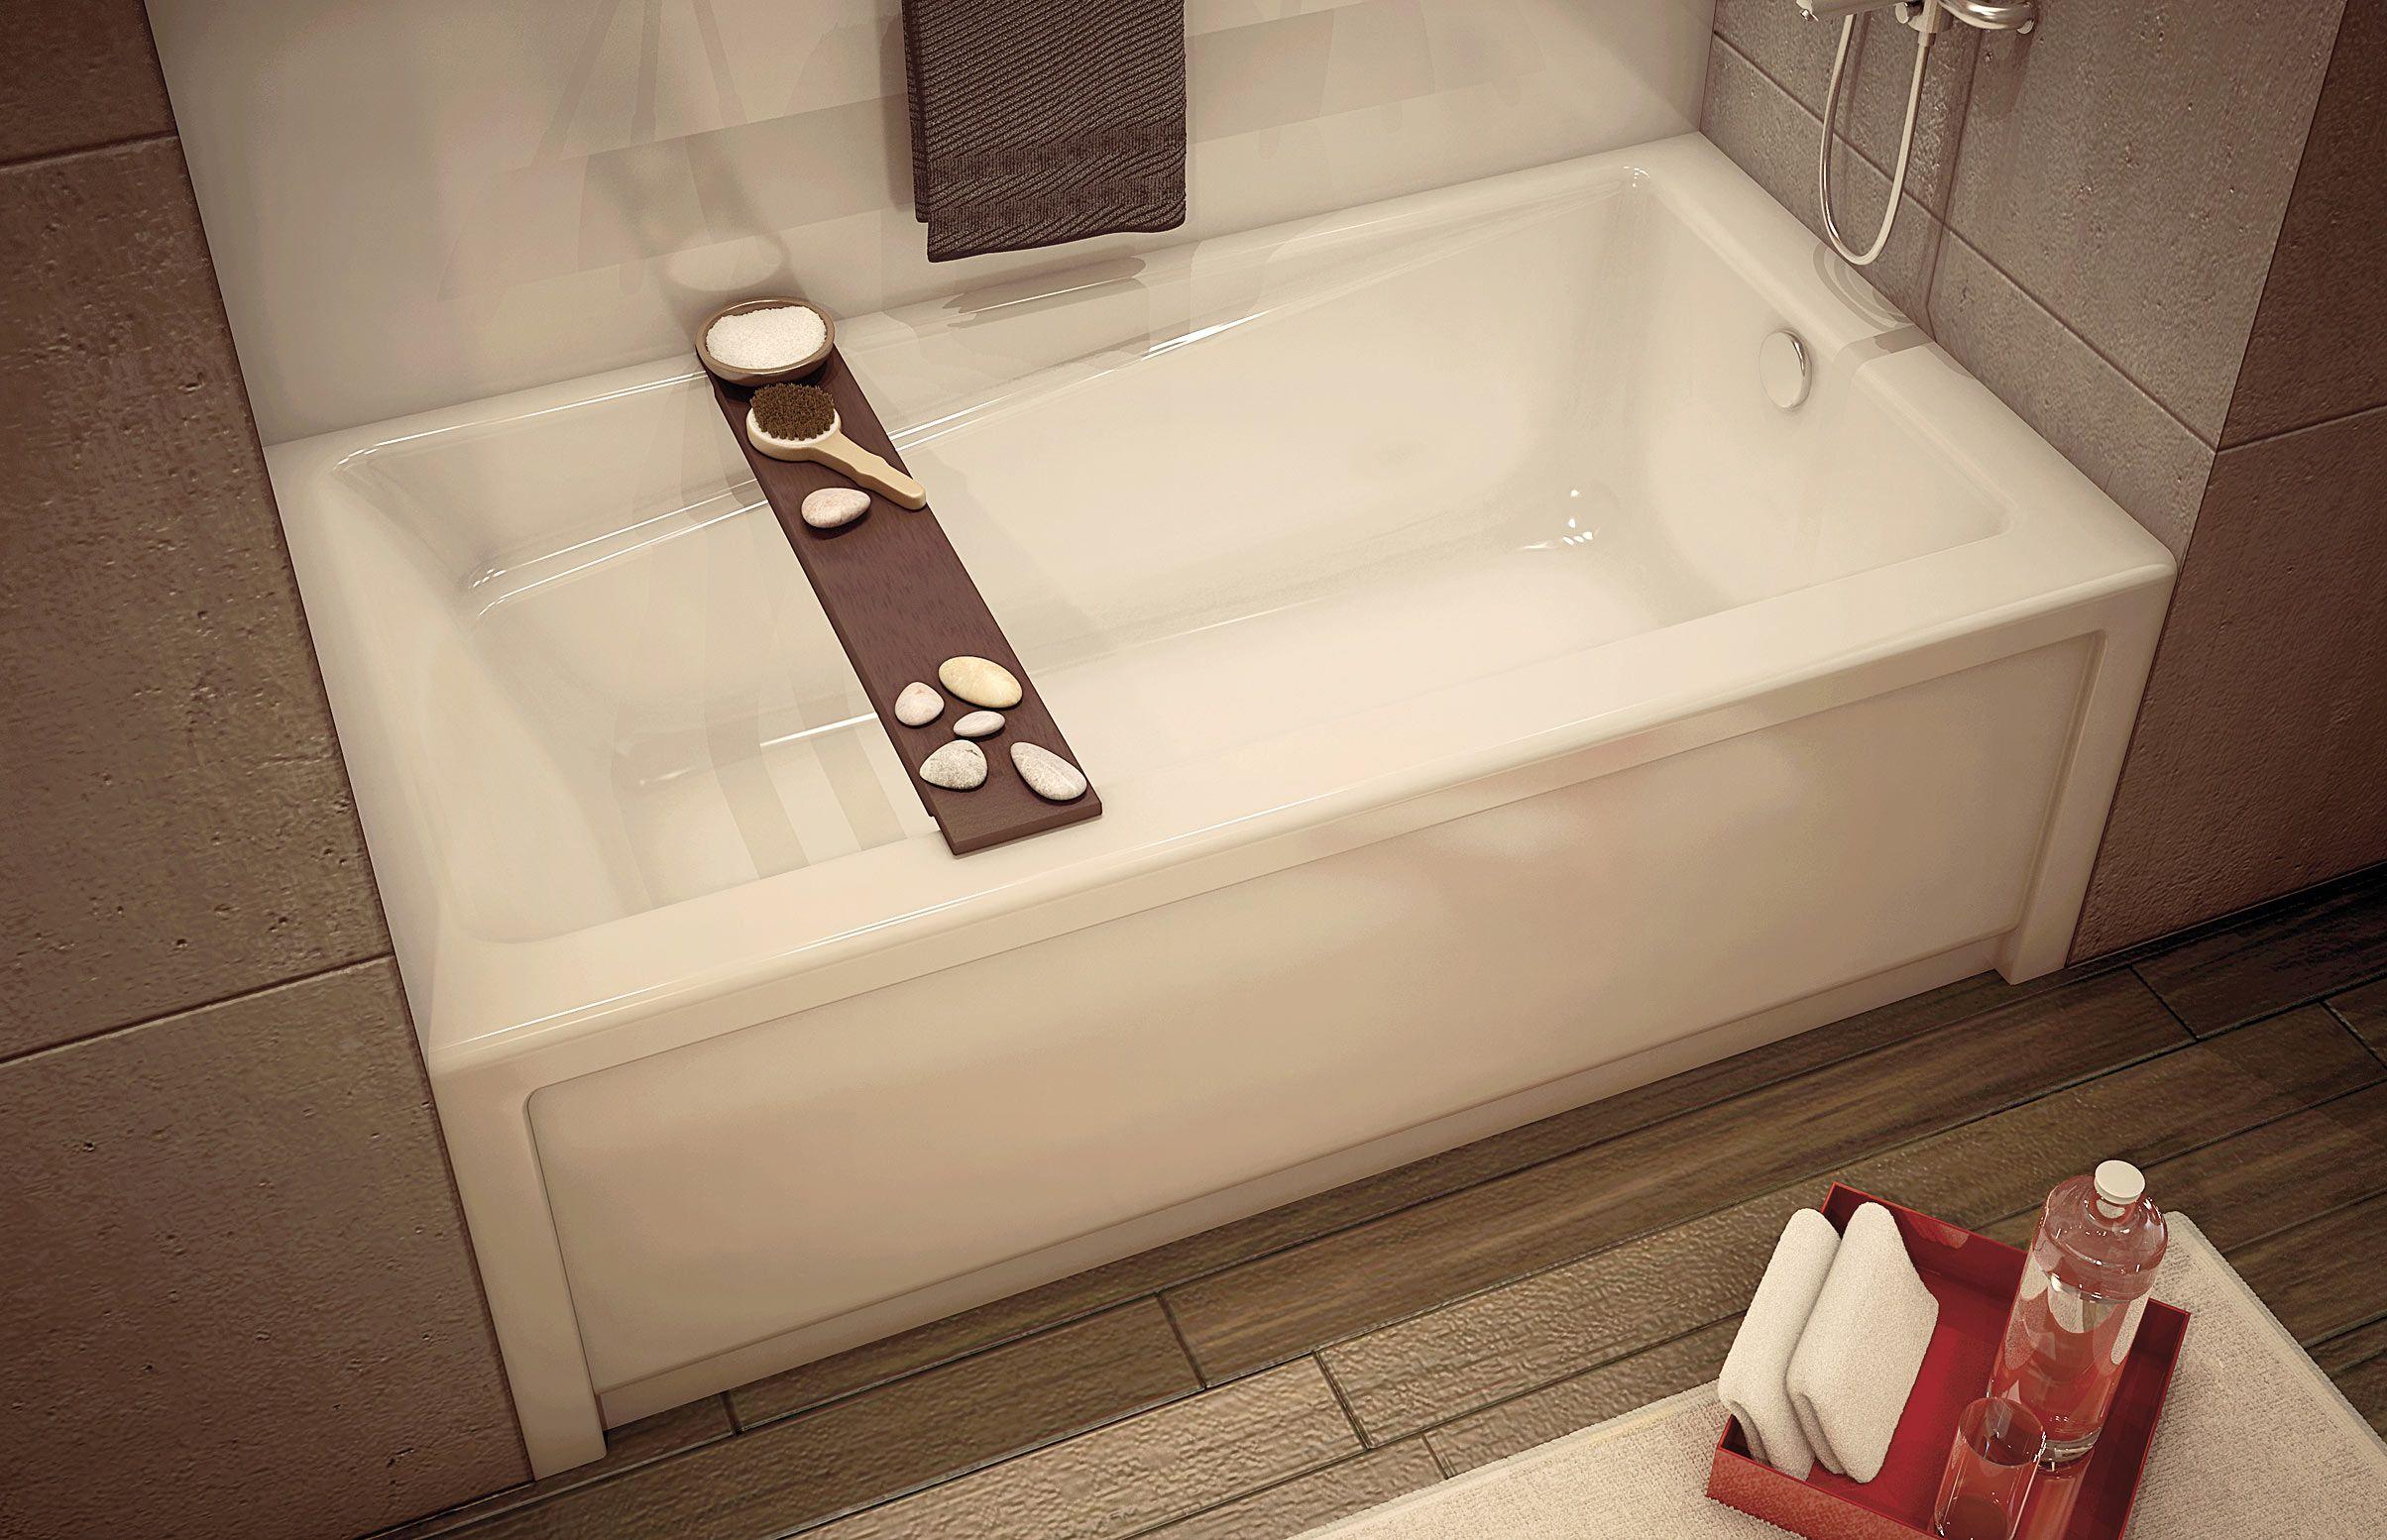 New Town (IFS) Alcove bathtub - Advanta by MAAX | Bathroom Remodel ...